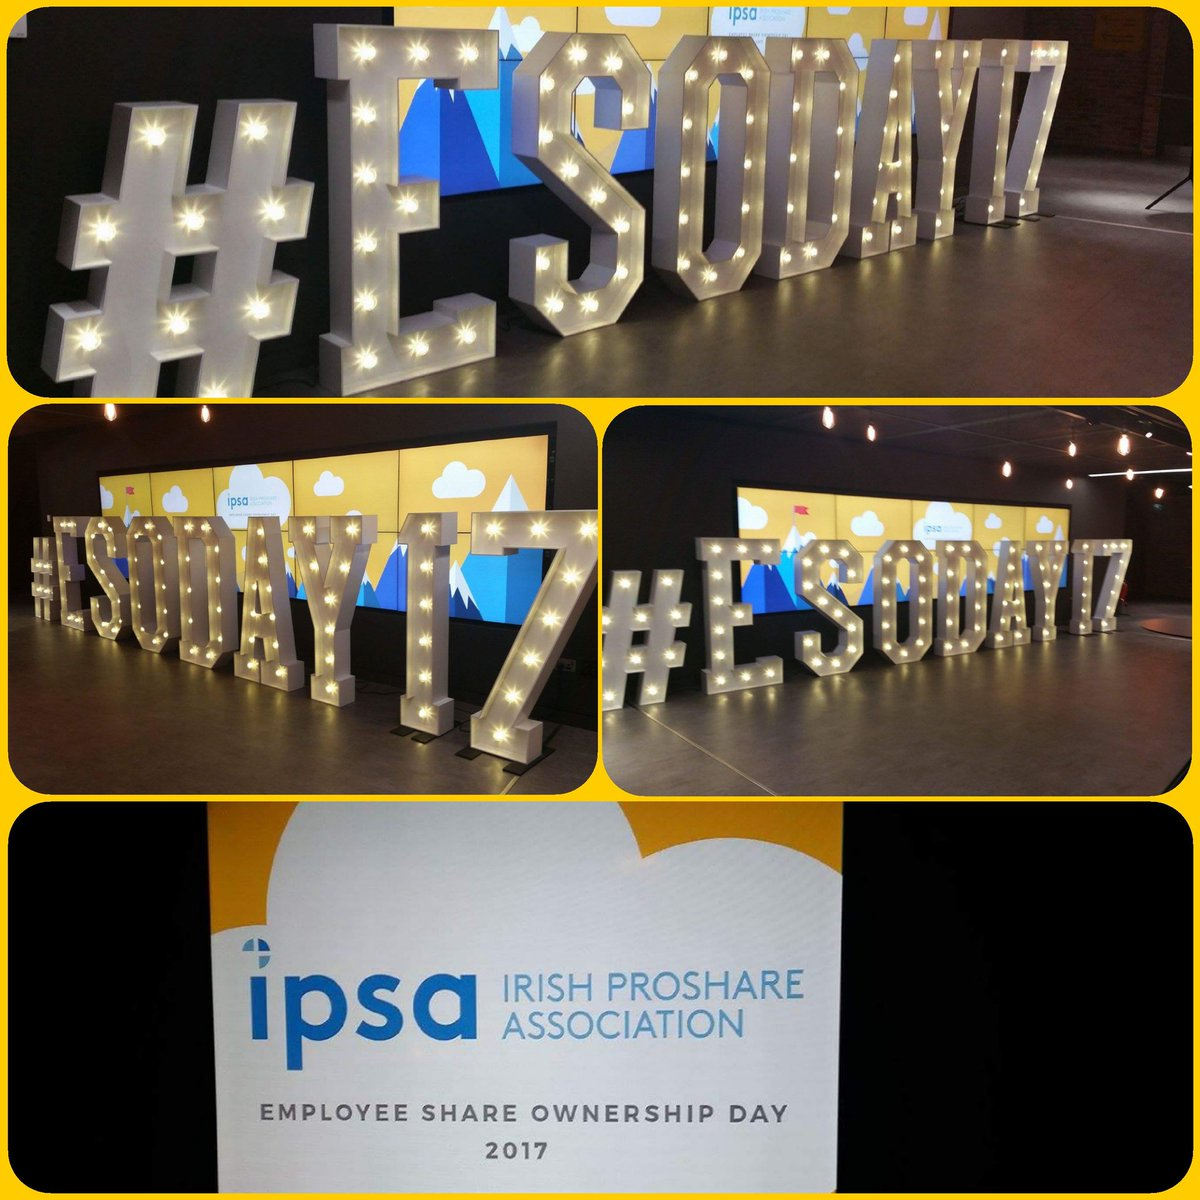 Happy #ESODAY17 from @LEDletters  #hollywoodledletters @IPSA_ie @ProShareUK @Google #Dublin  #Ireland #lightupletters #IPSAawards17  <br>http://pic.twitter.com/aFj9KzN29T